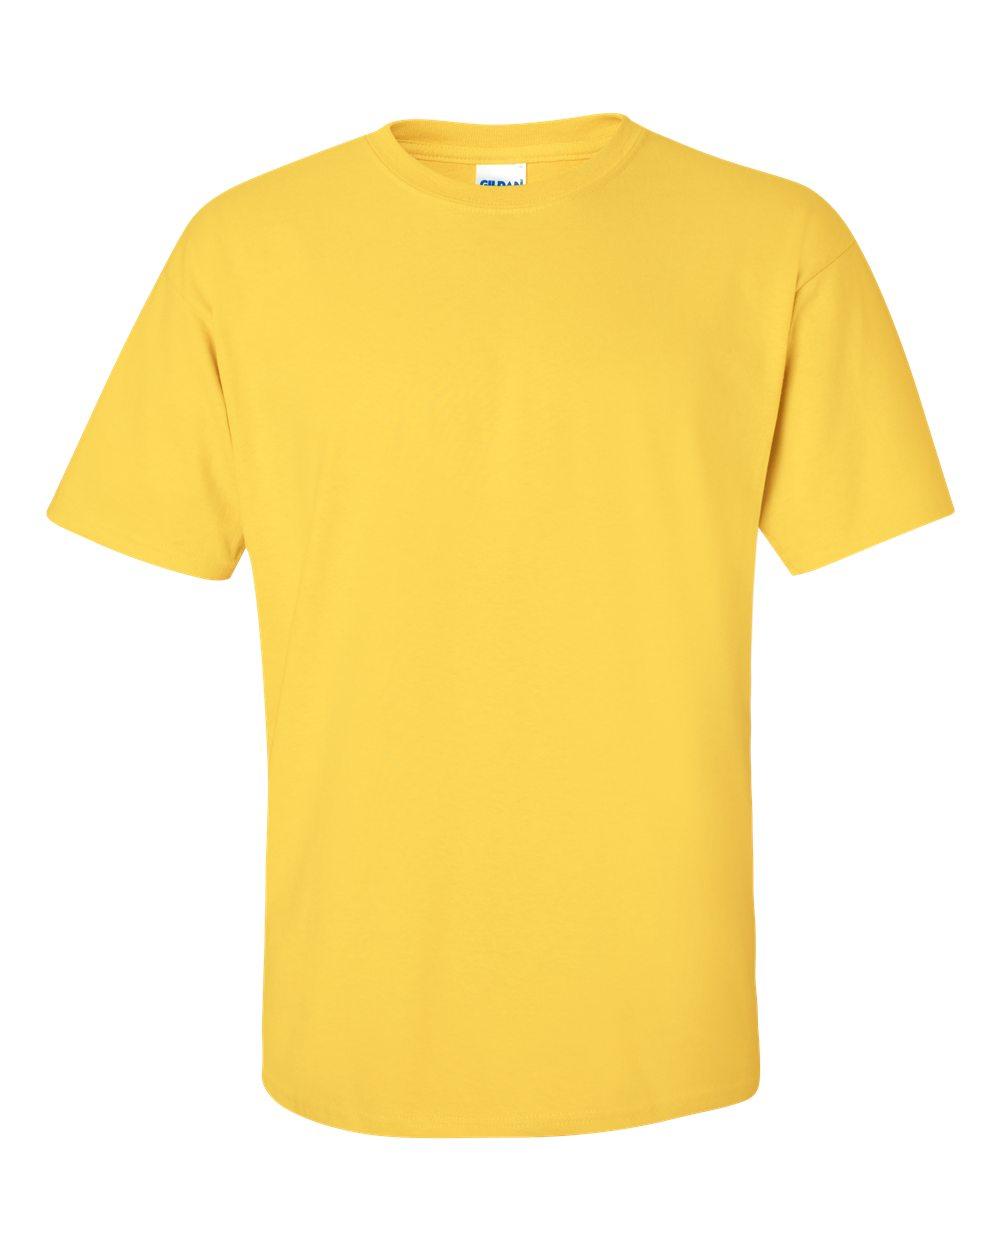 Top 10 shirts for custom screen printing kirkwood trading for Custom printed t shirts